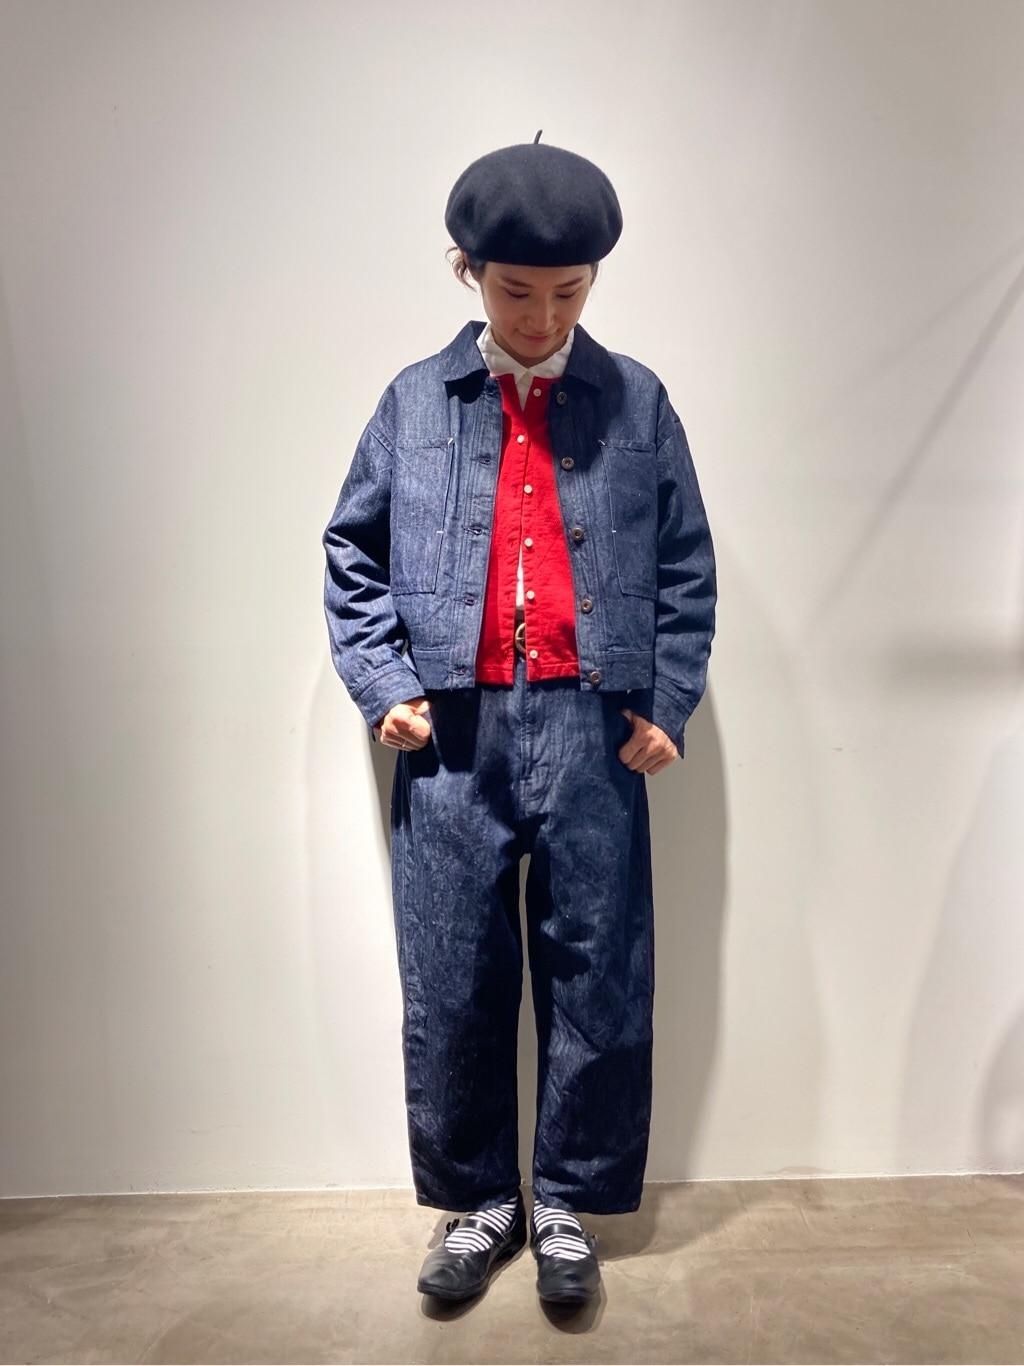 yuni / bulle de savon 京都路面 身長:159cm 2020.09.09